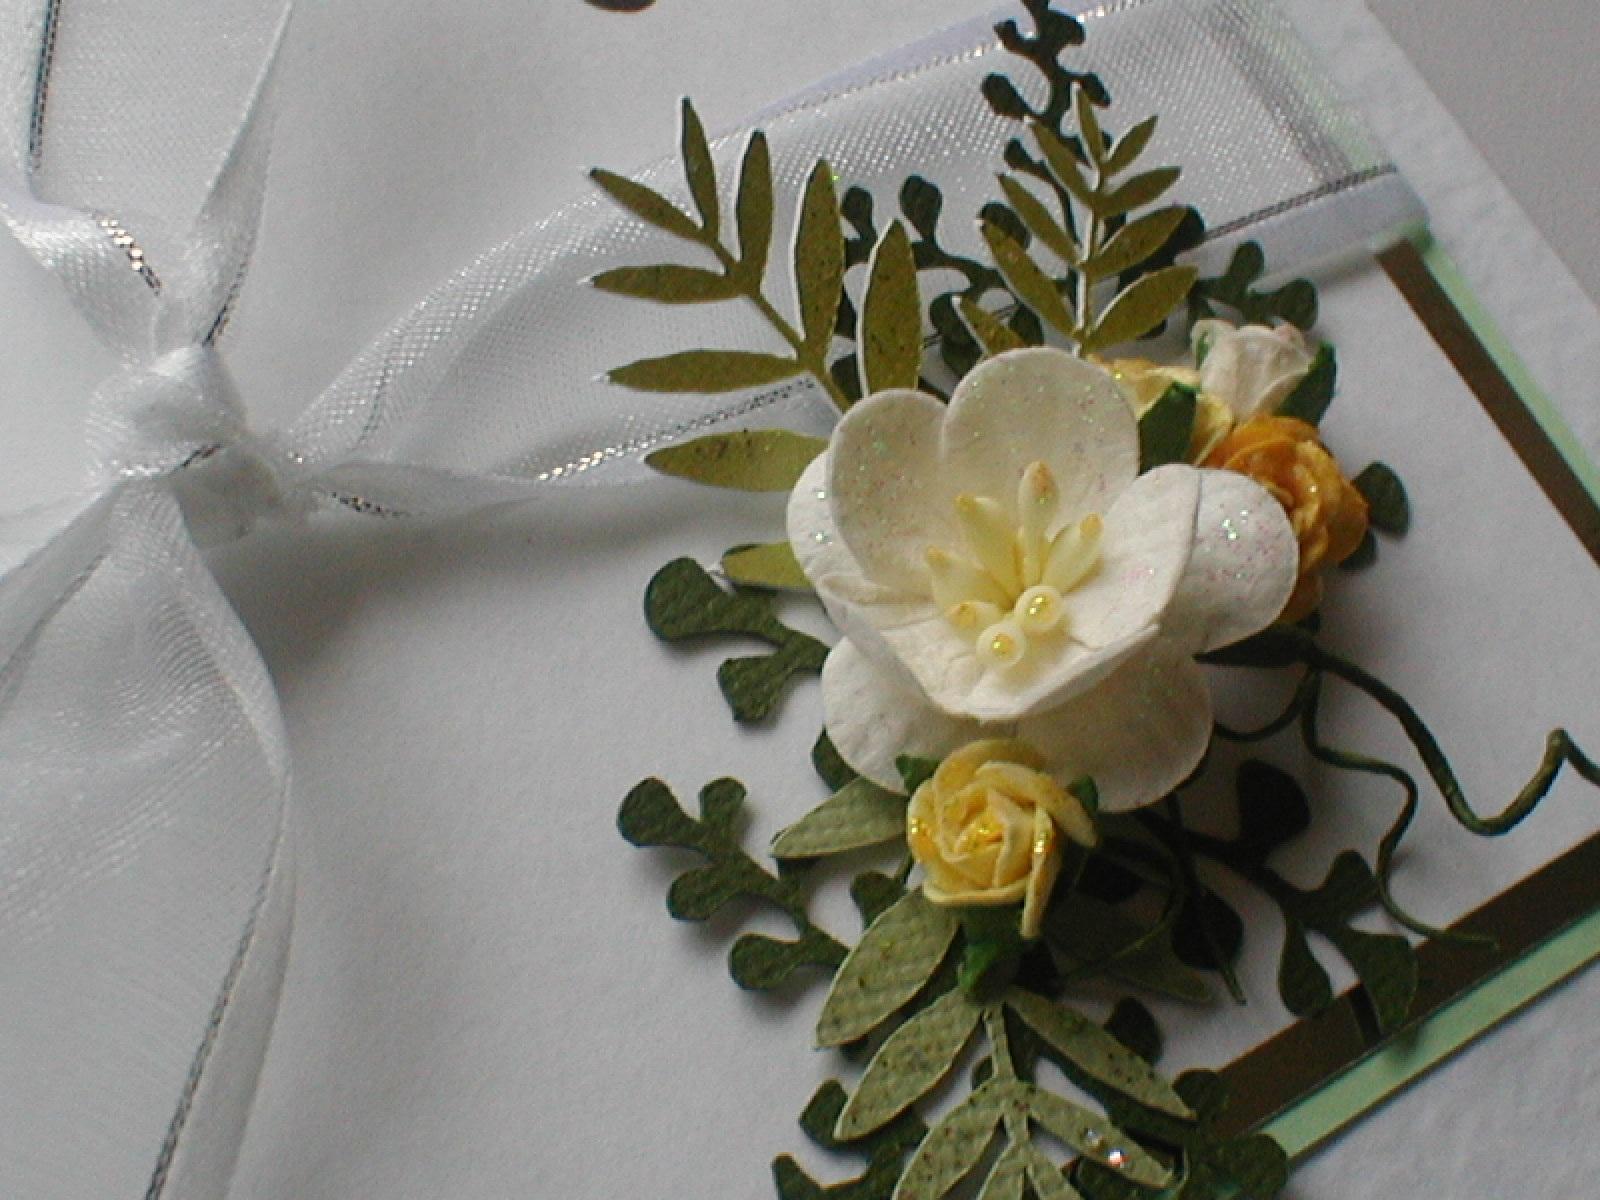 http://2.bp.blogspot.com/_T9M47pSIONs/S96xUxou6vI/AAAAAAAAA5Y/St_5wkJCejU/s1600/wedding%252BApr1003.jpg